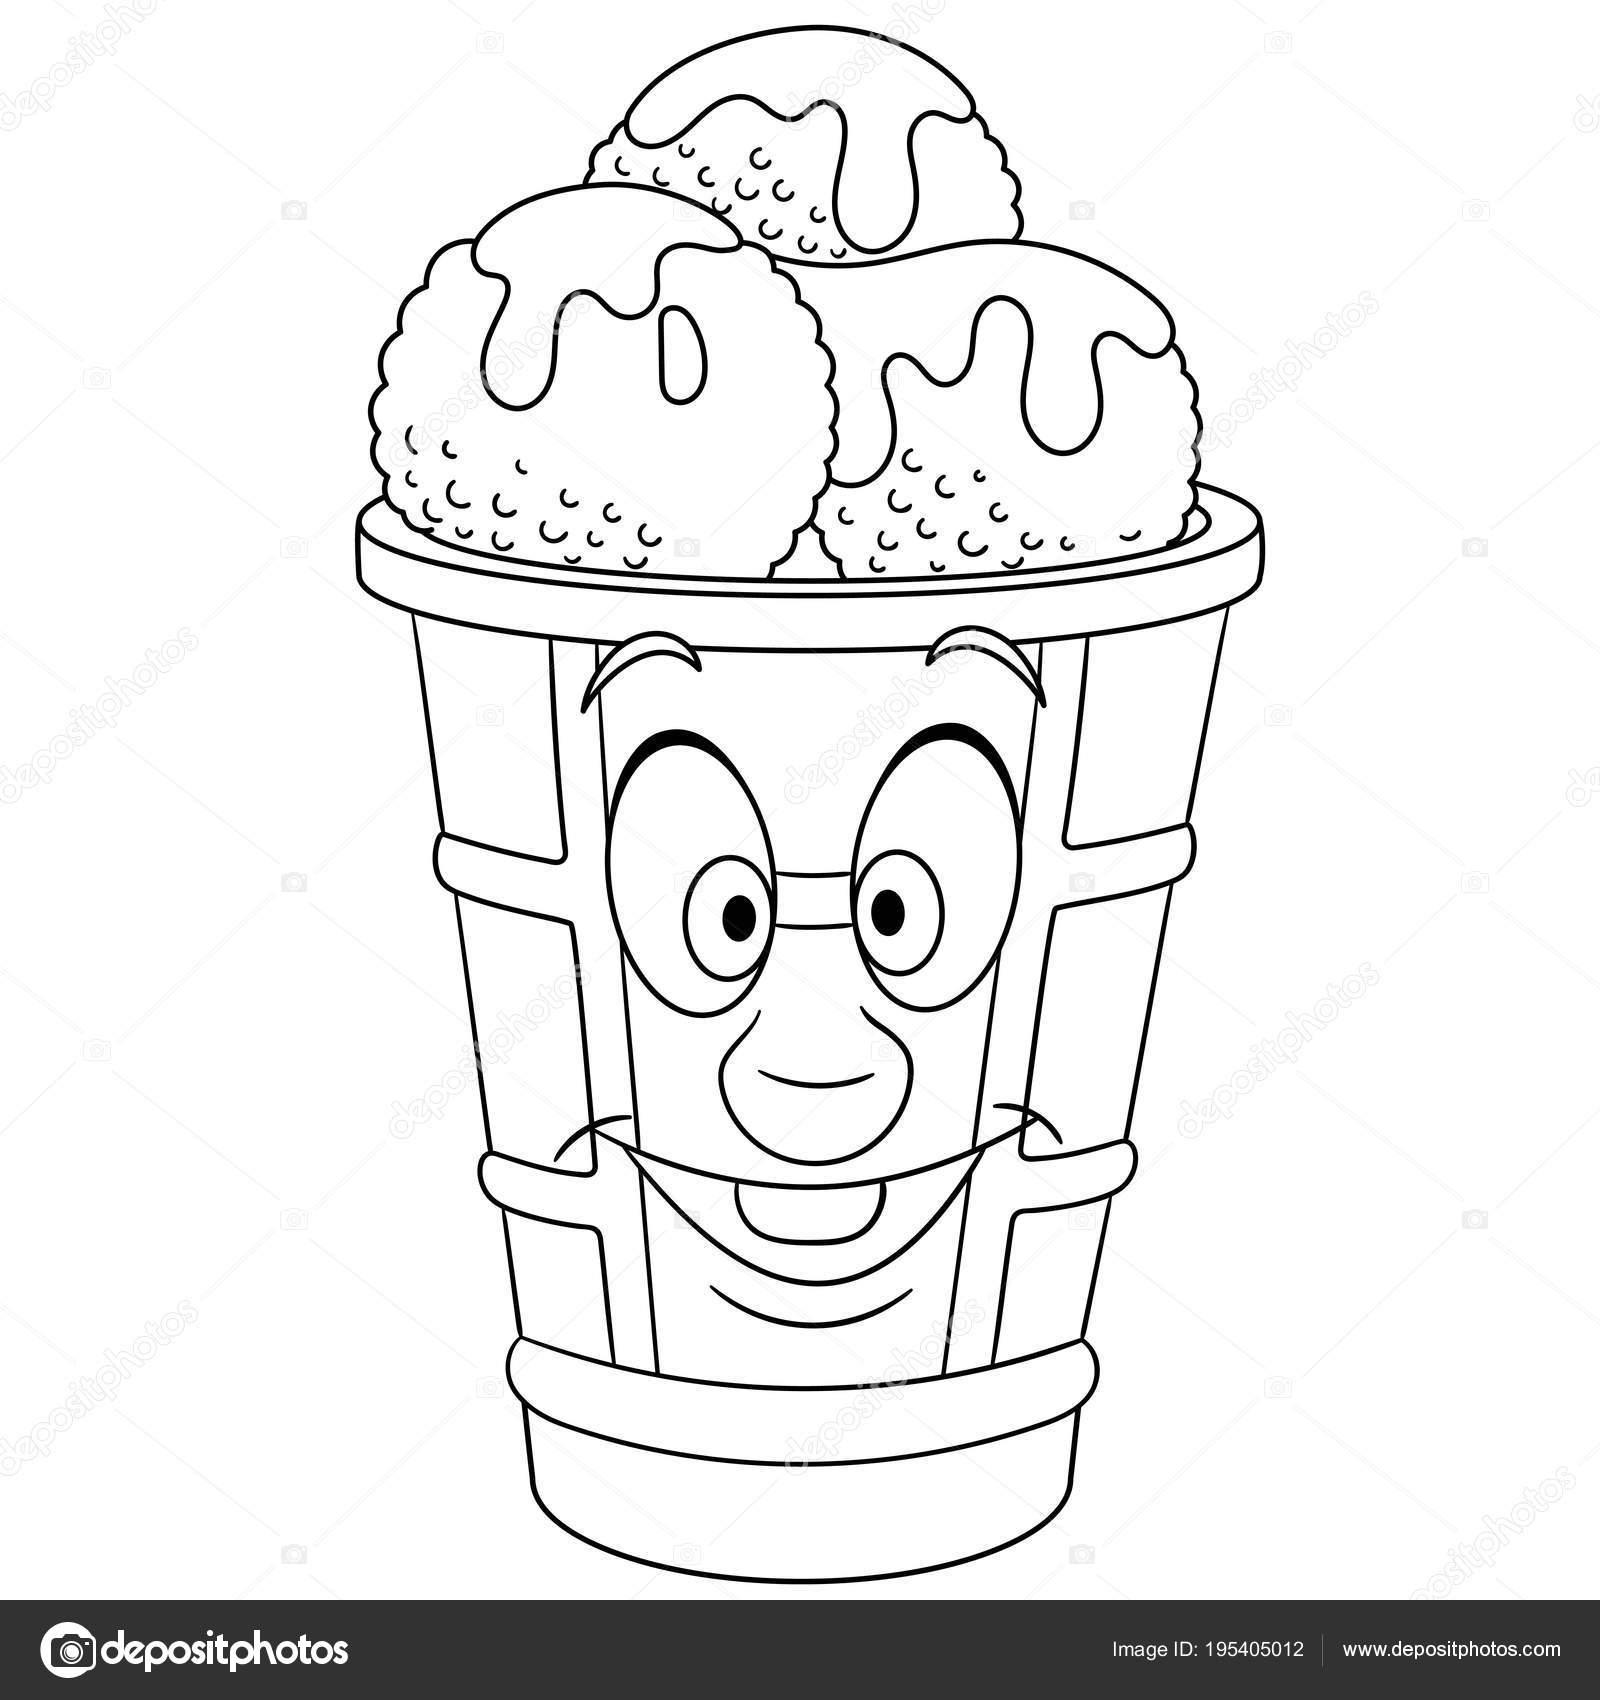 çizgi Film Tatlı Dondurma Kaşık Stok Vektör Sybirko 195405012